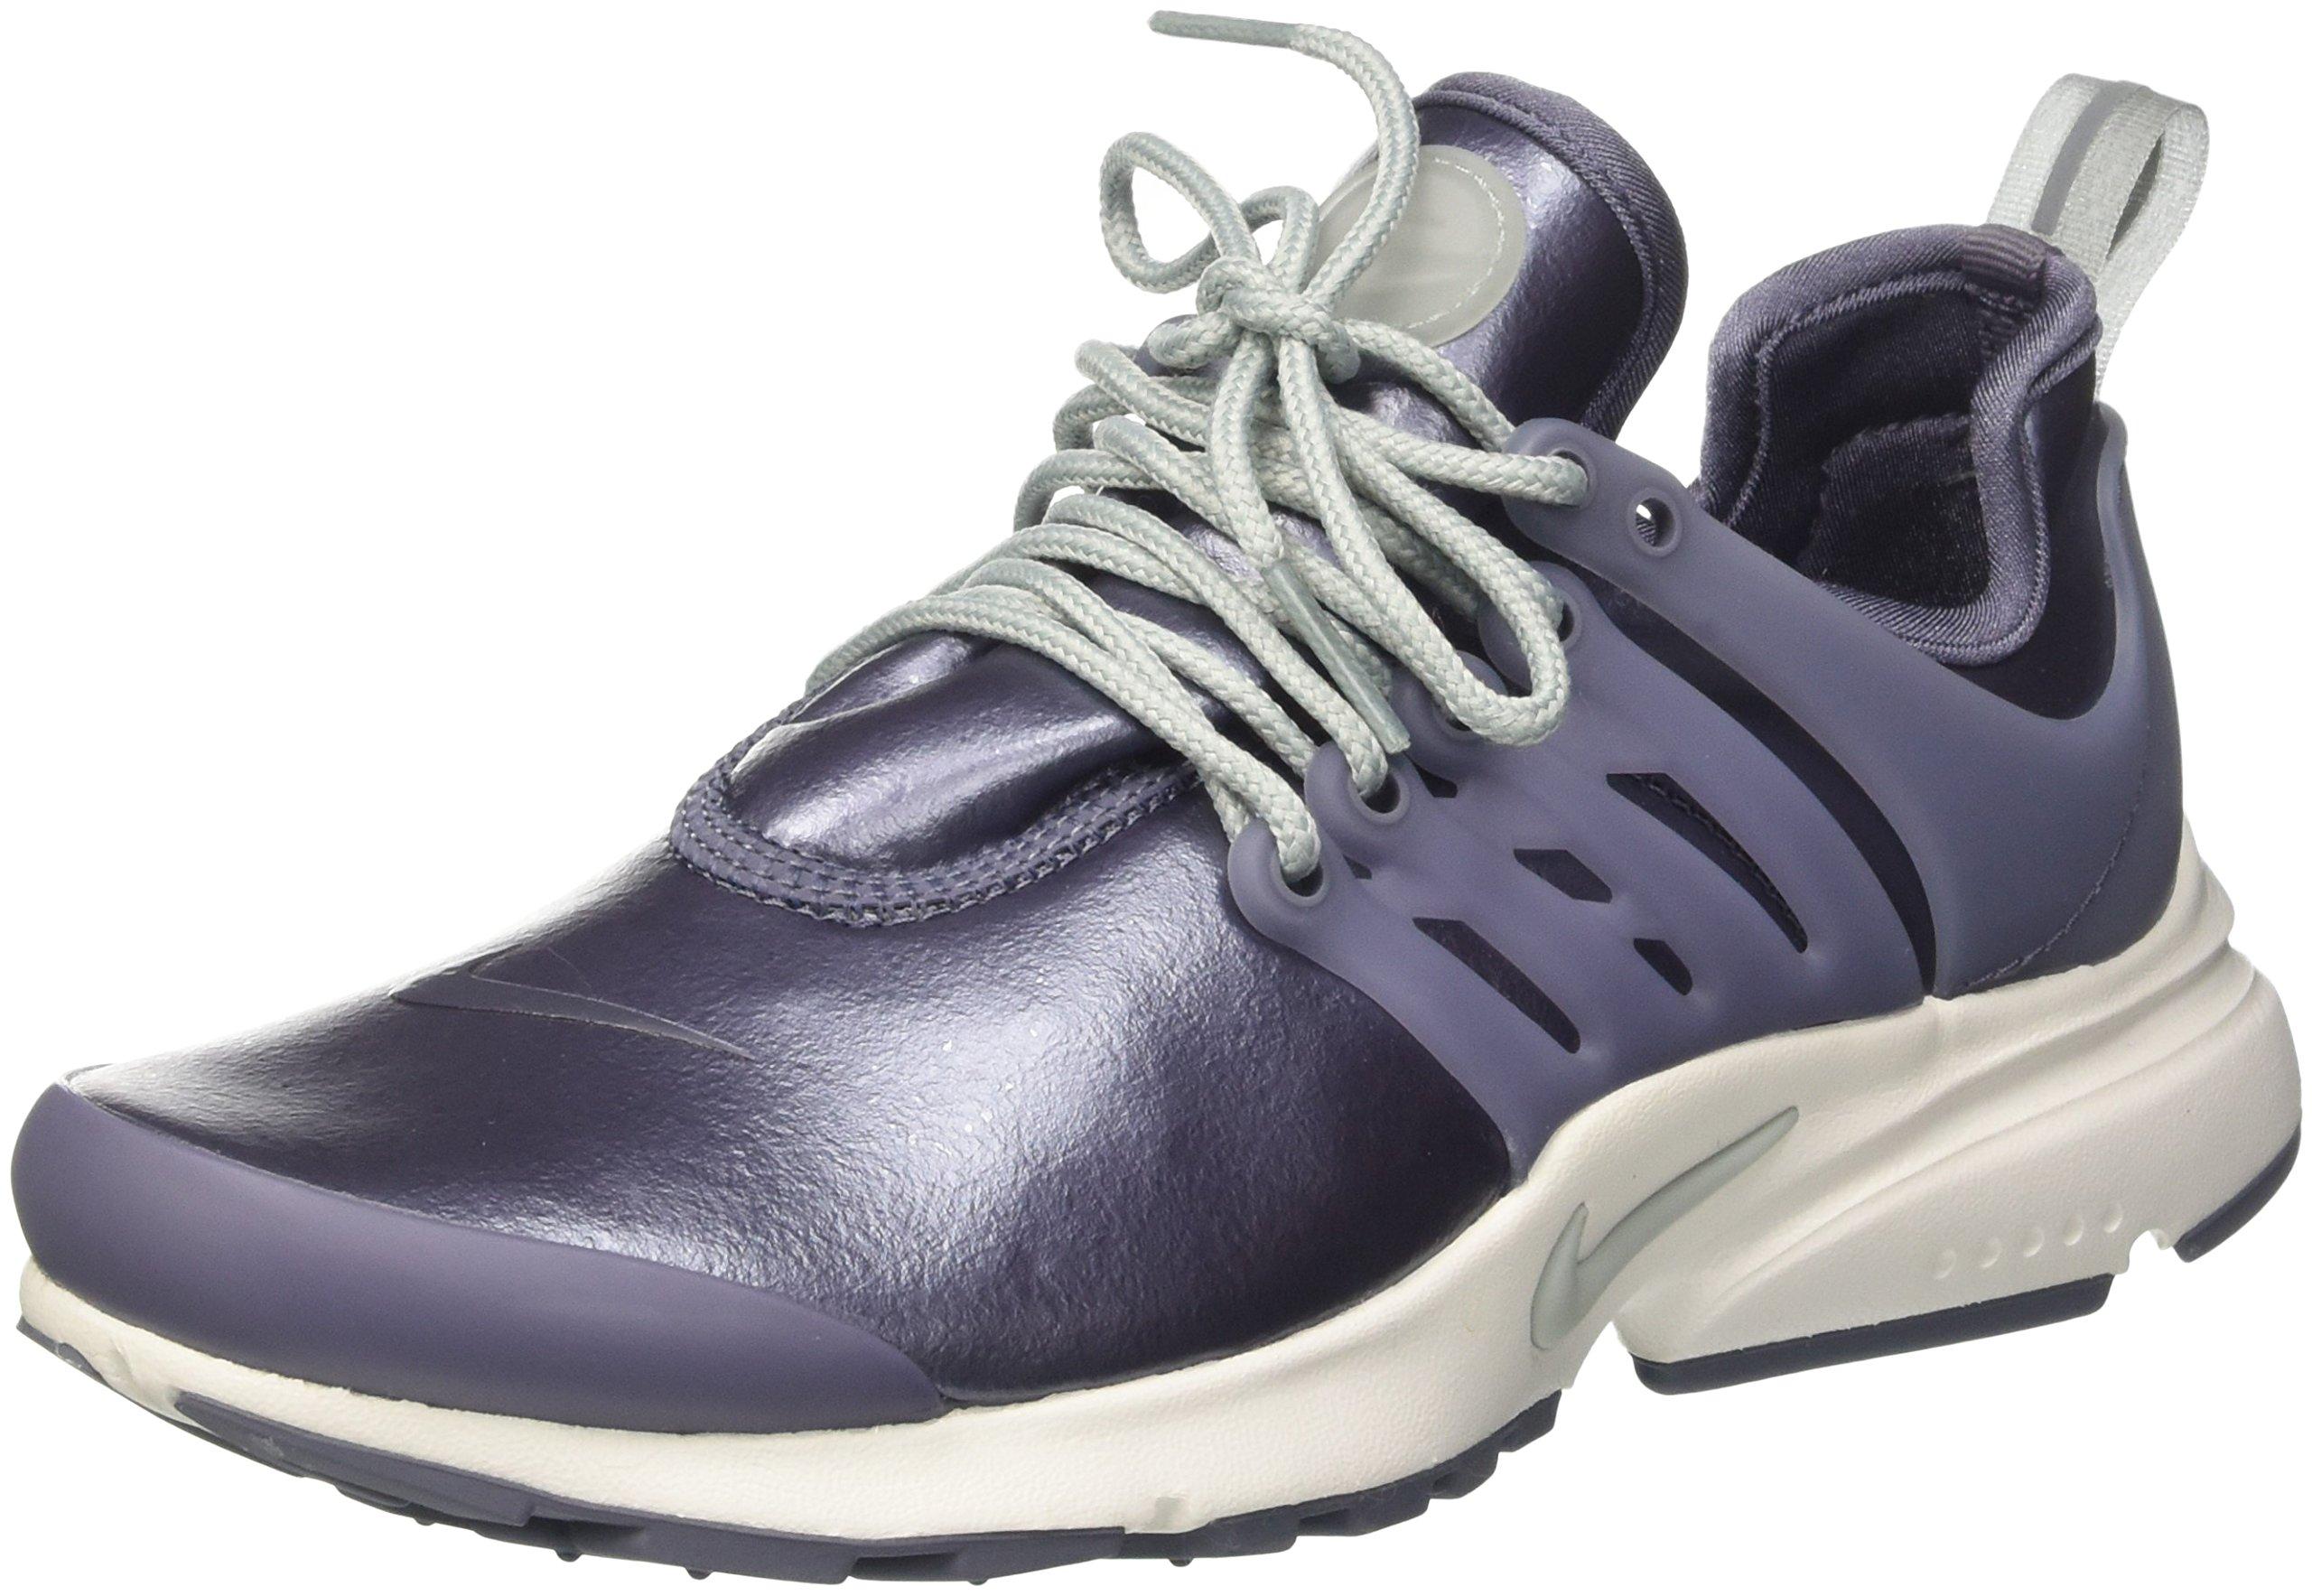 Air Eu Basses Nike FemmeGris Grey 00540 Carbon Cool 5 metallic Presto light SeSneakers Pumice uiTPXOkZ